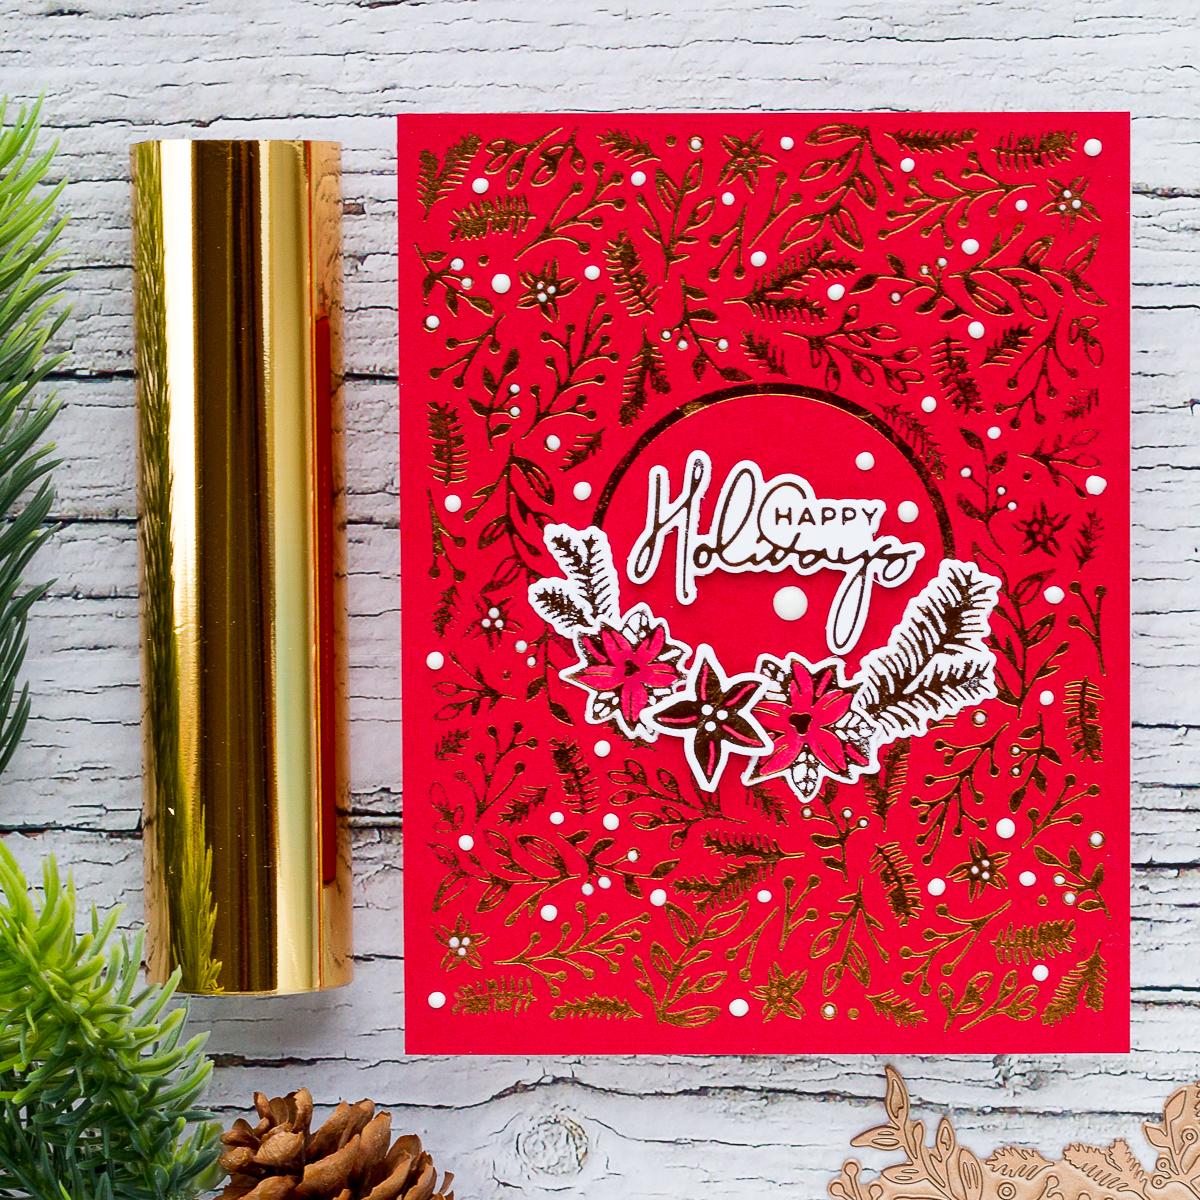 Elegant Foiled Handmade Christmas Cards With Ilda Spellbinder Blog